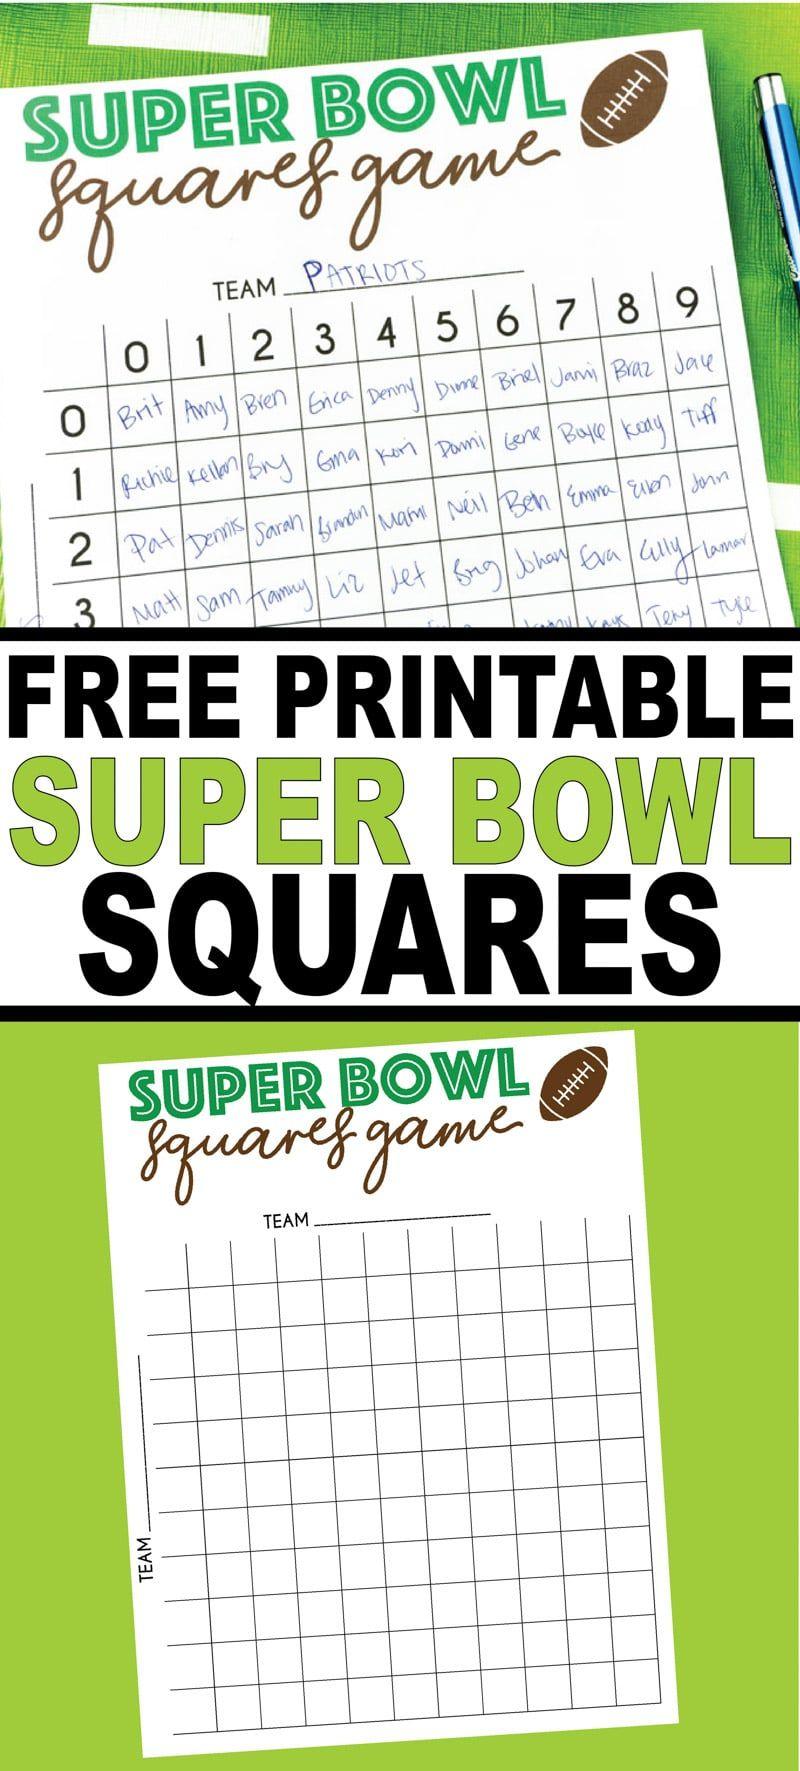 Free Printable Super Bowl Squares Template Superbowl Squares Super Bowl Football Squares